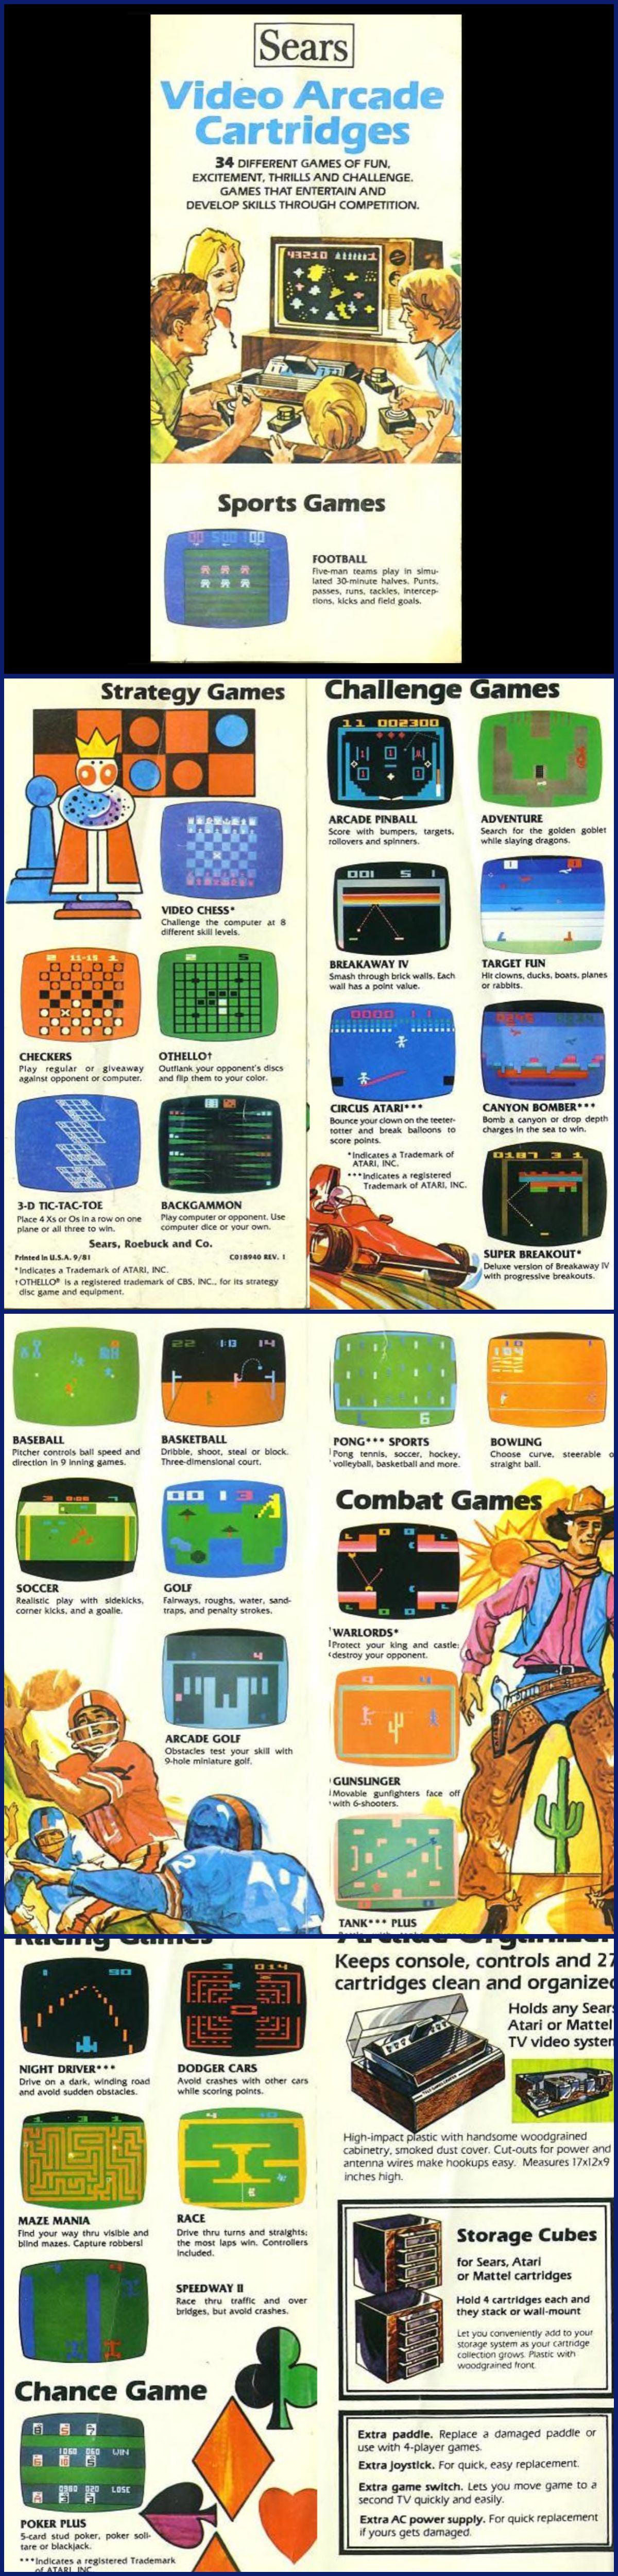 Sears' Atari Catalog of Video Arcade Cartridges (September